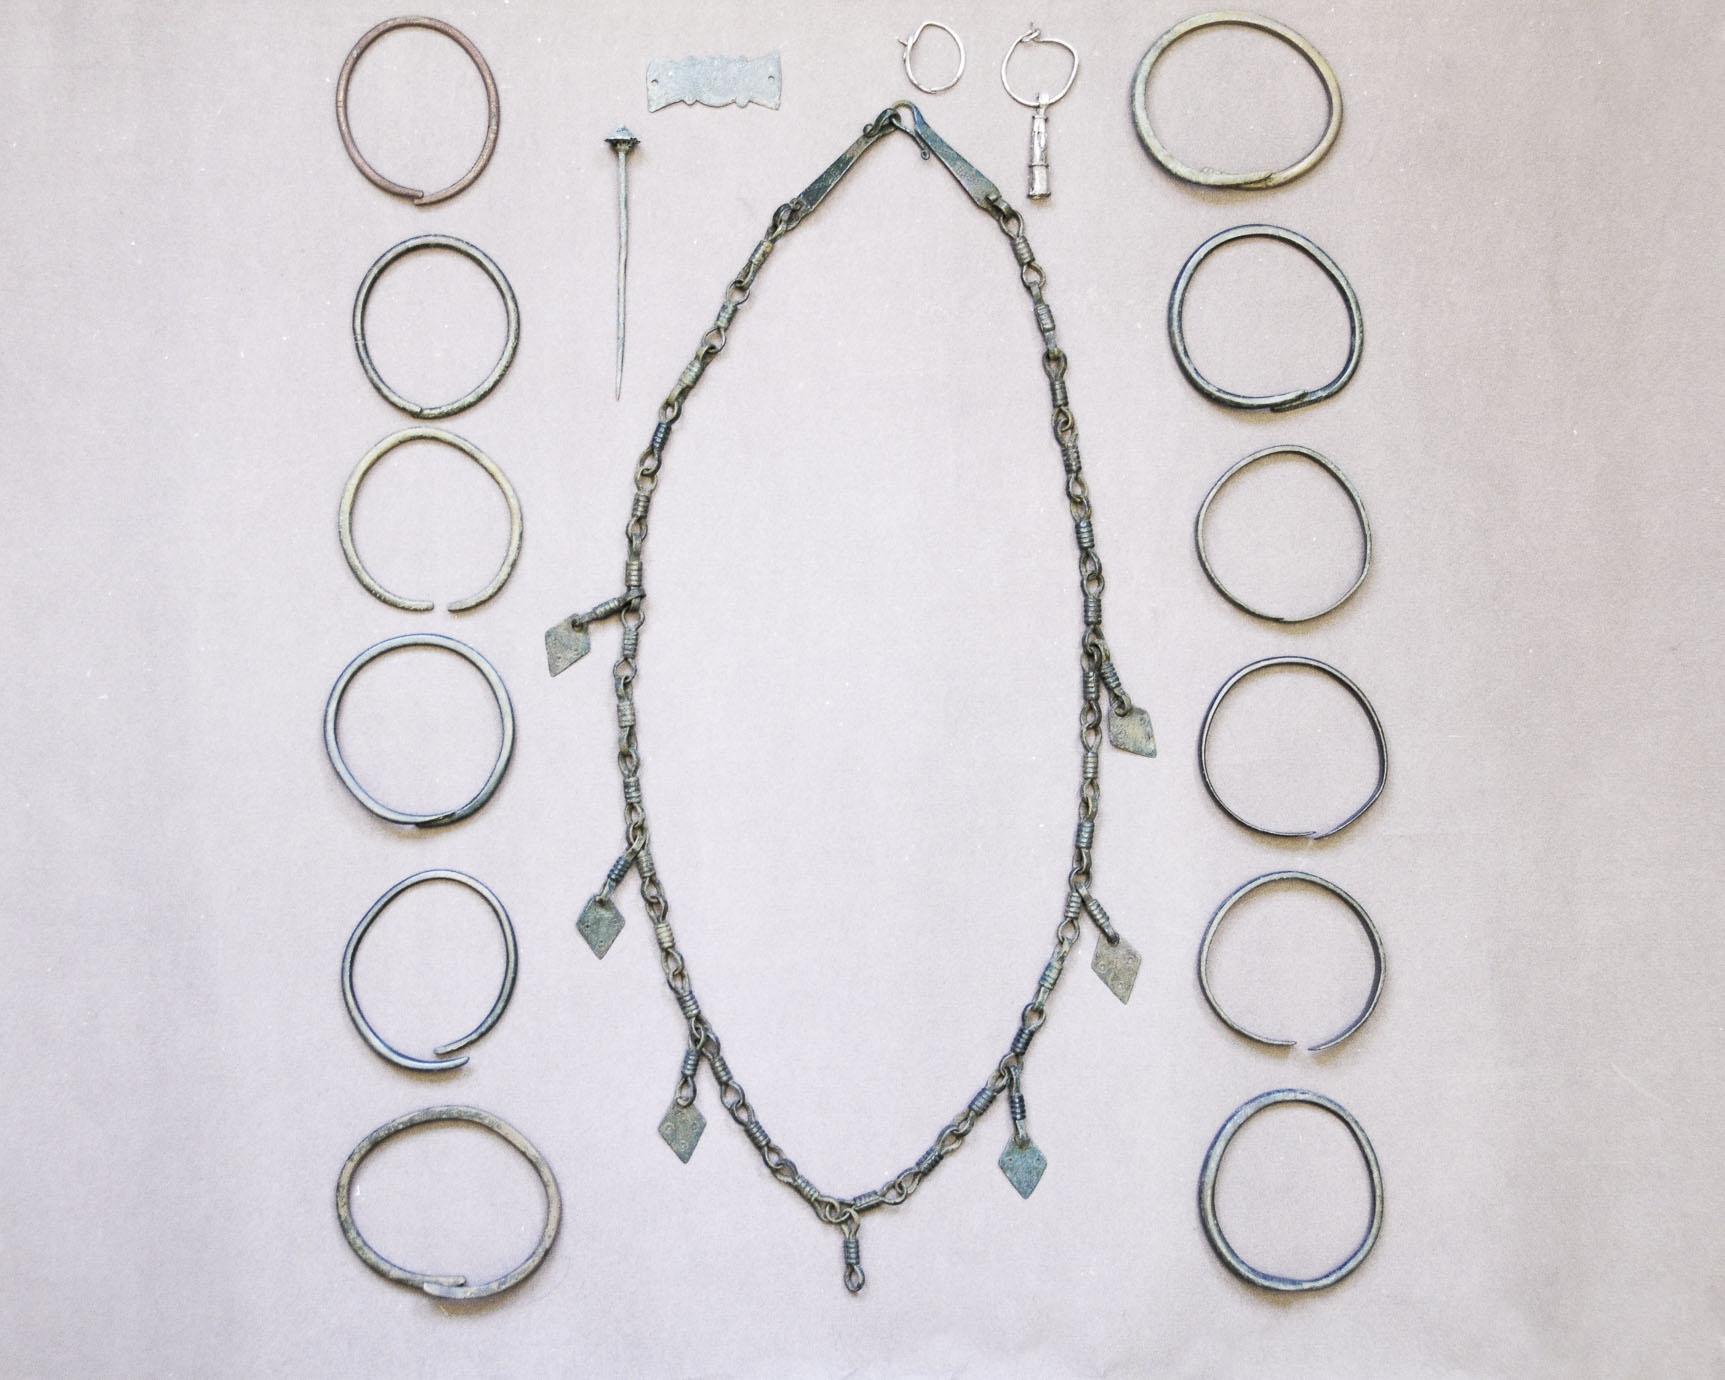 troyan-museum-arheologichesko-nasledstvo-2